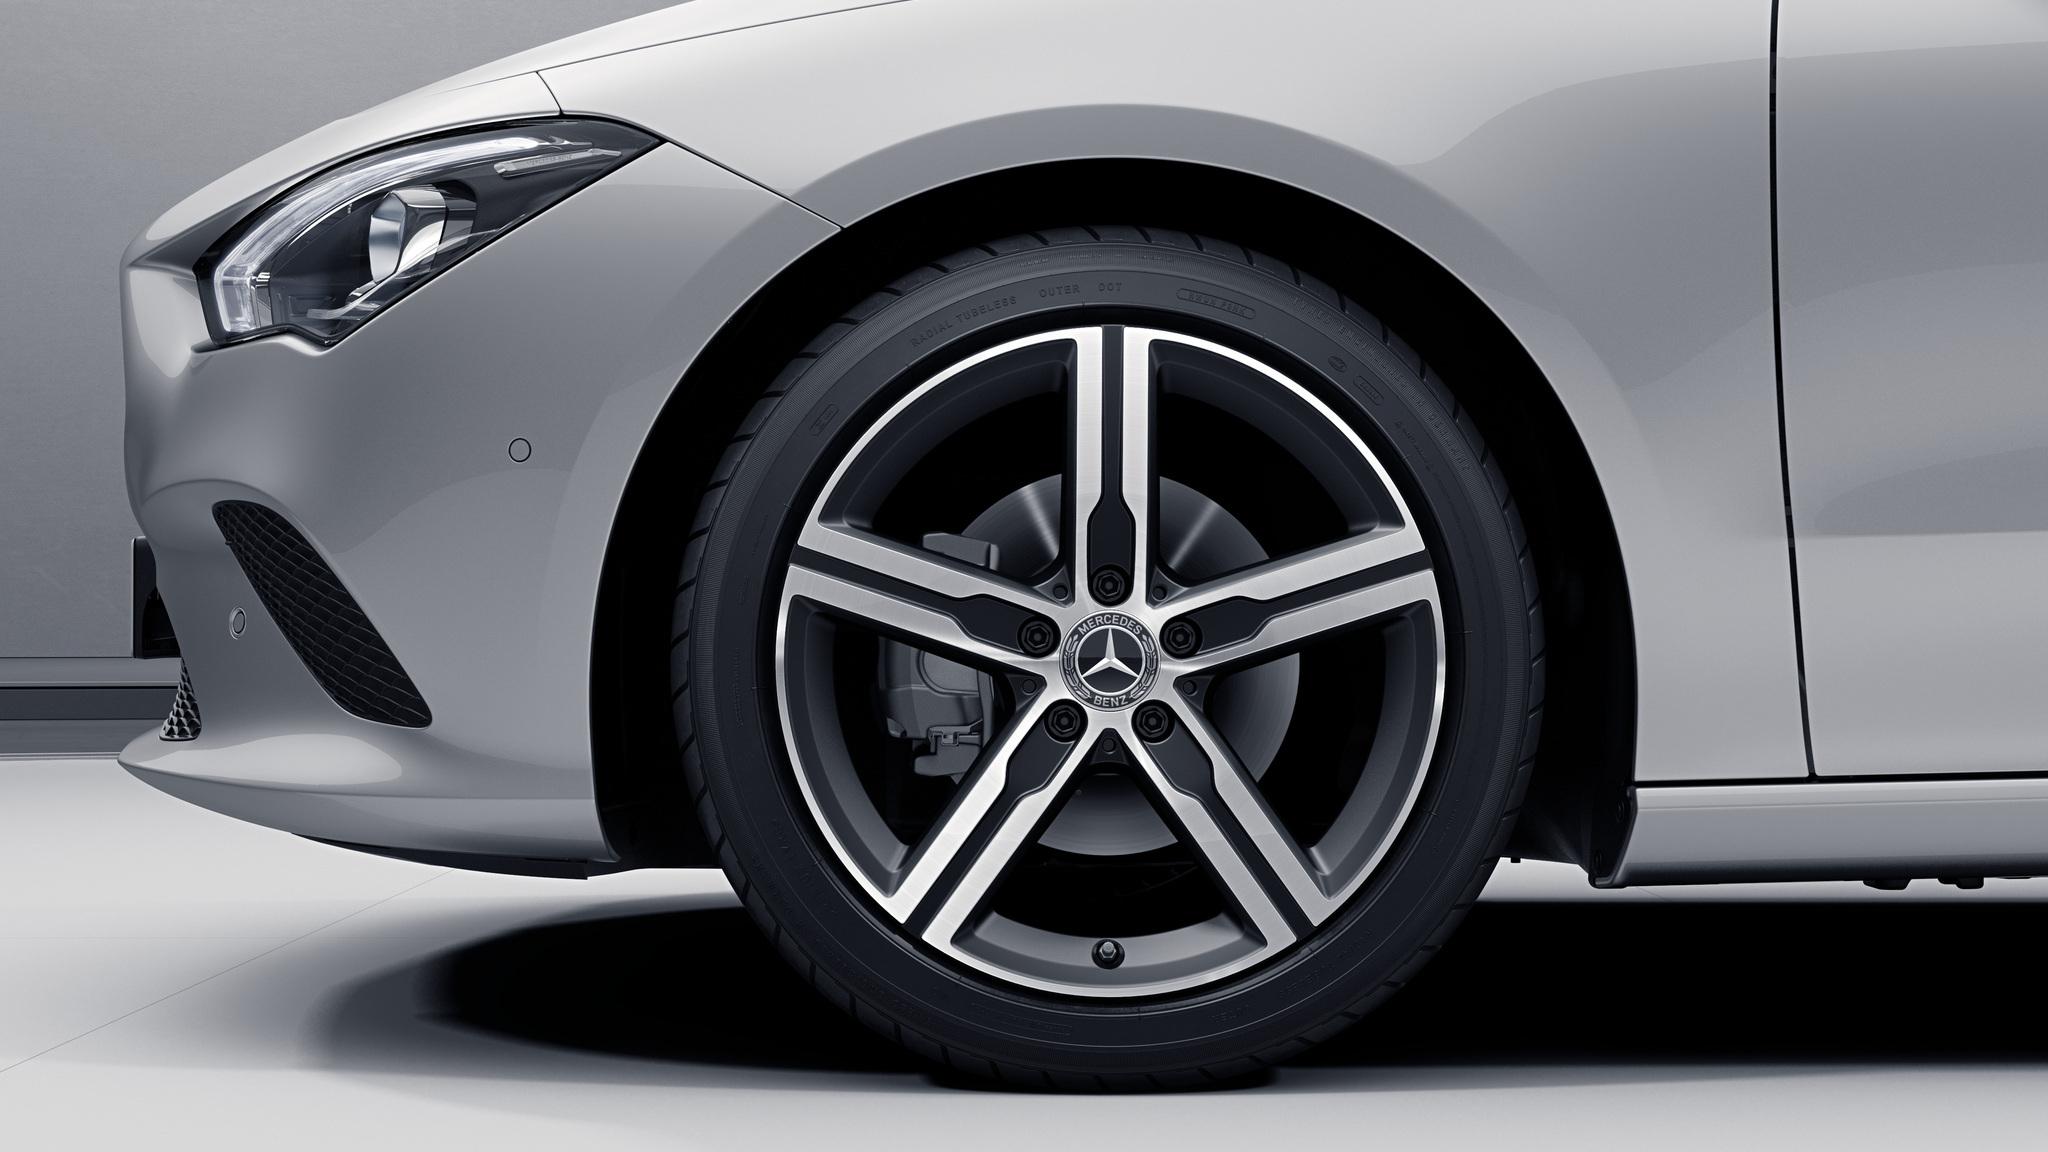 "Jantes 18"" à 5 branches de la Mercedes-Benz CLA"